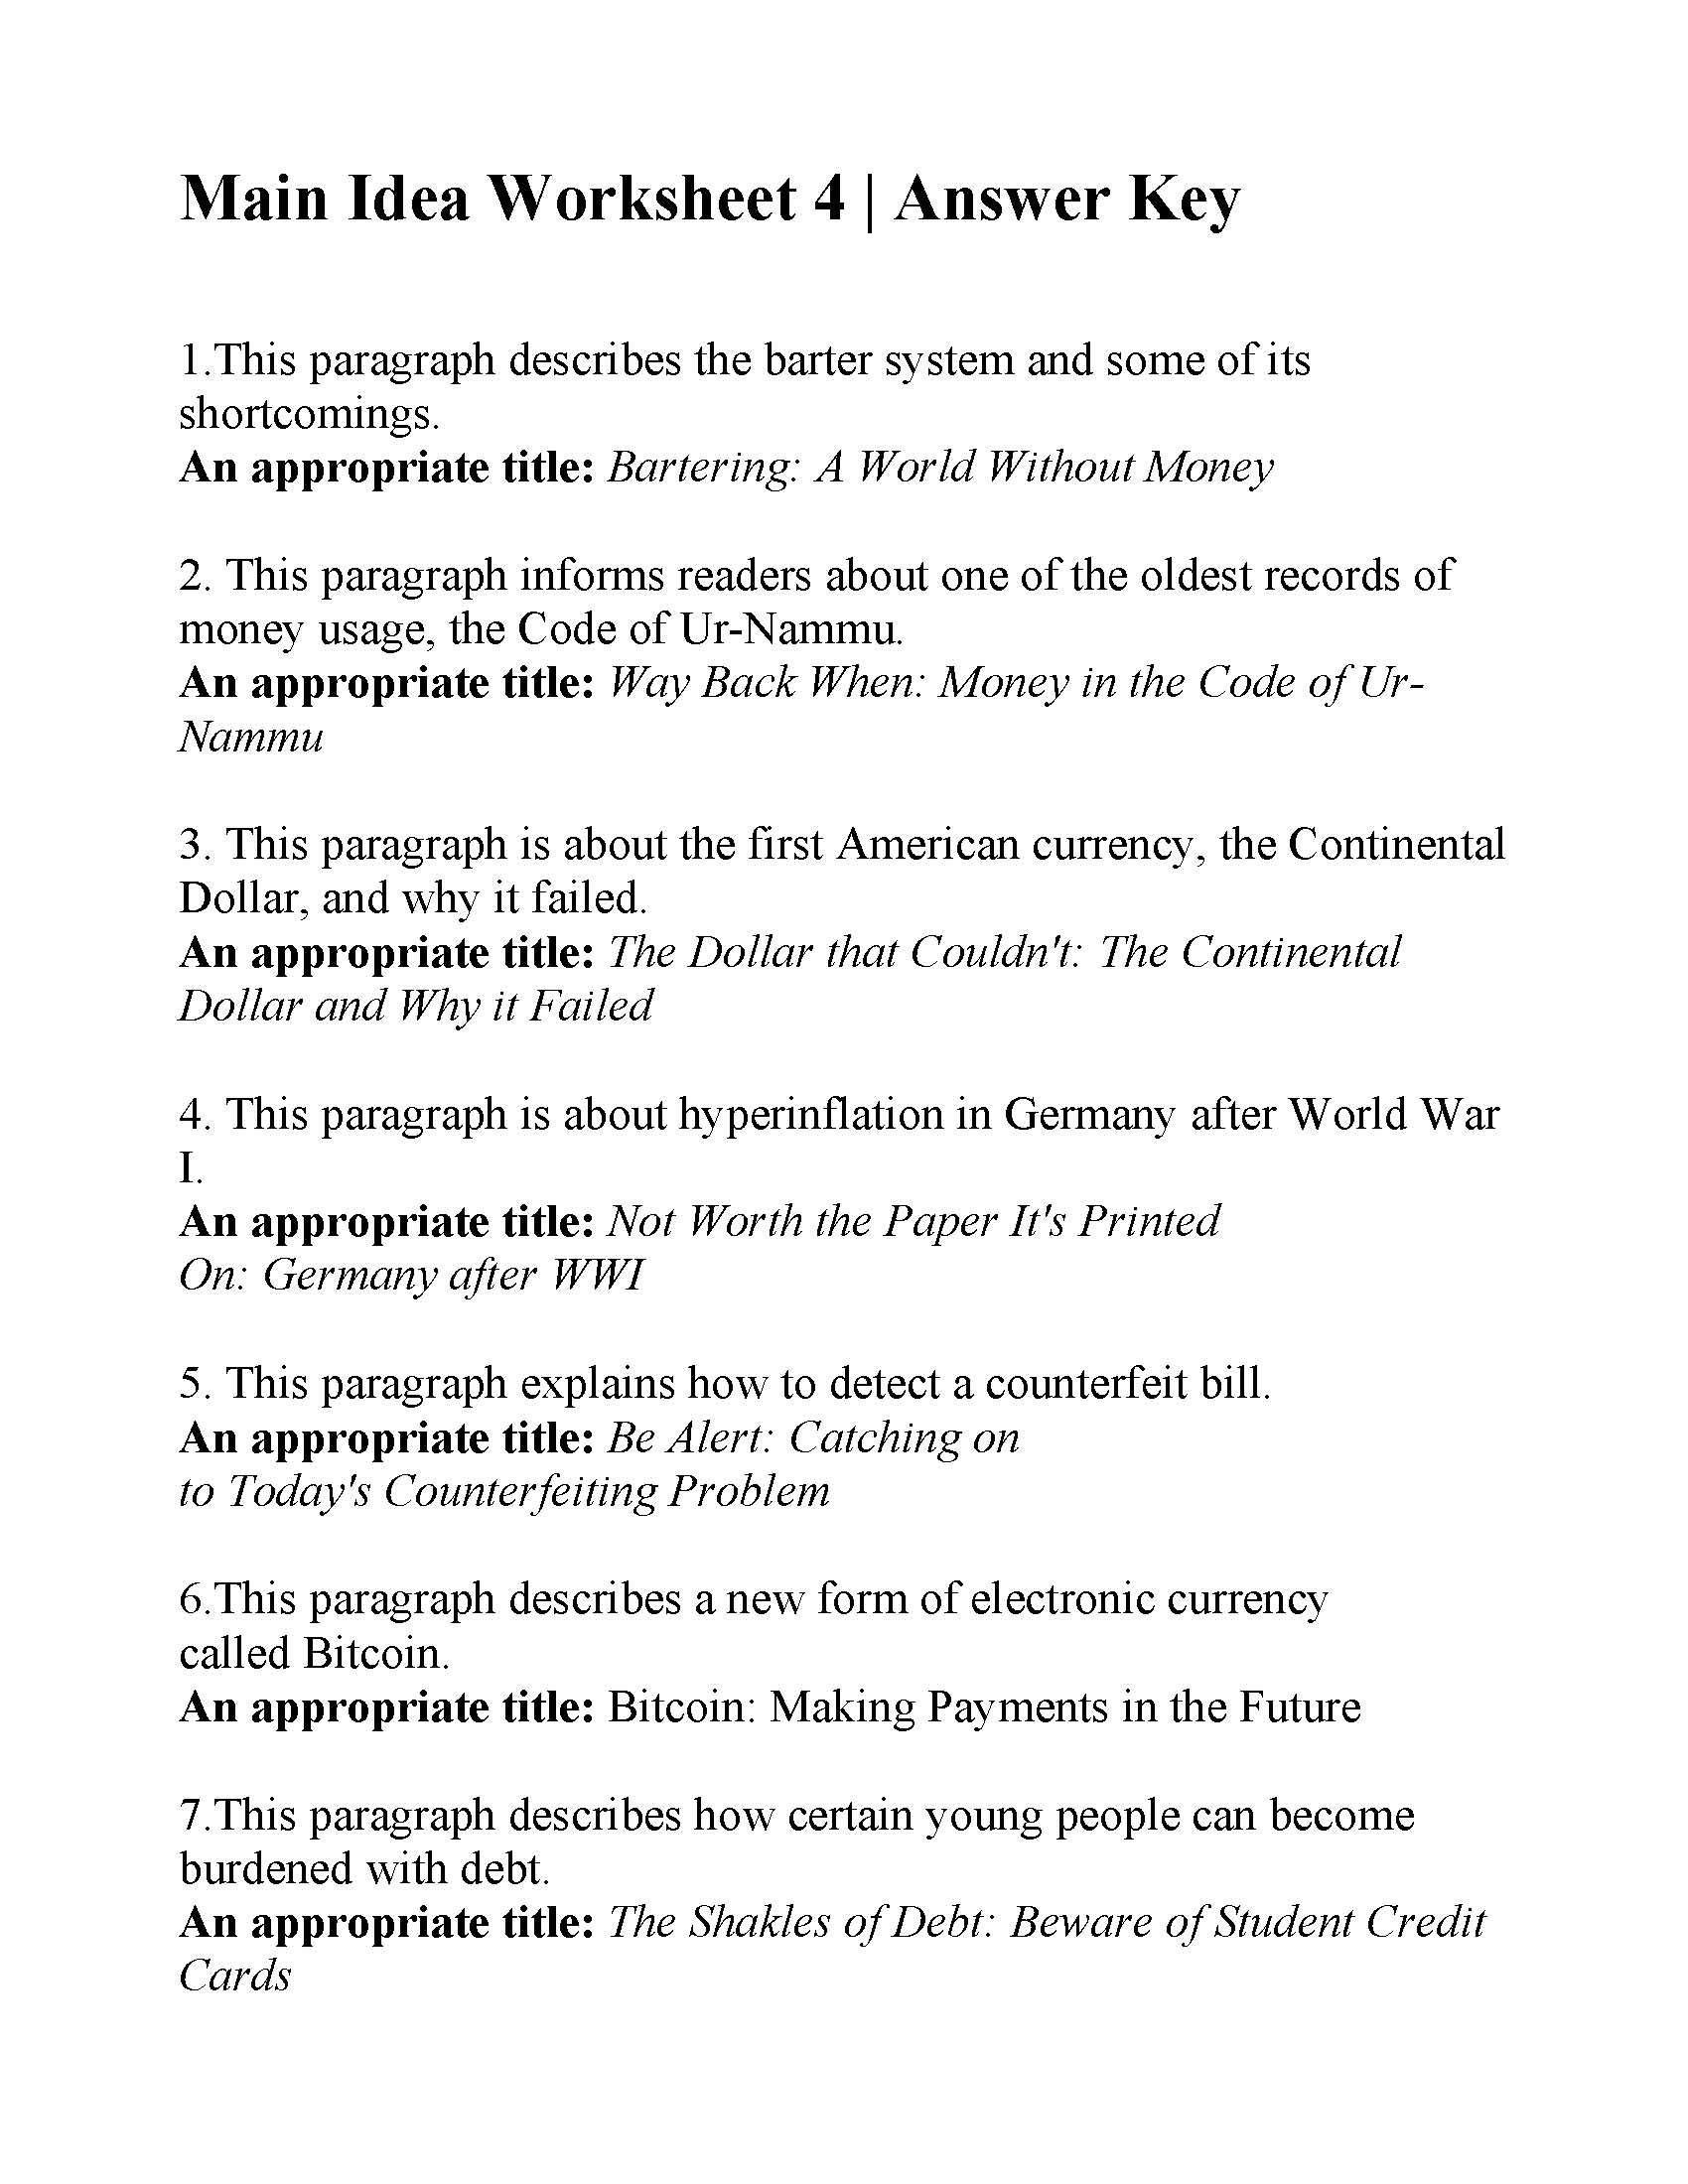 Main Idea Worksheet 4 Answers